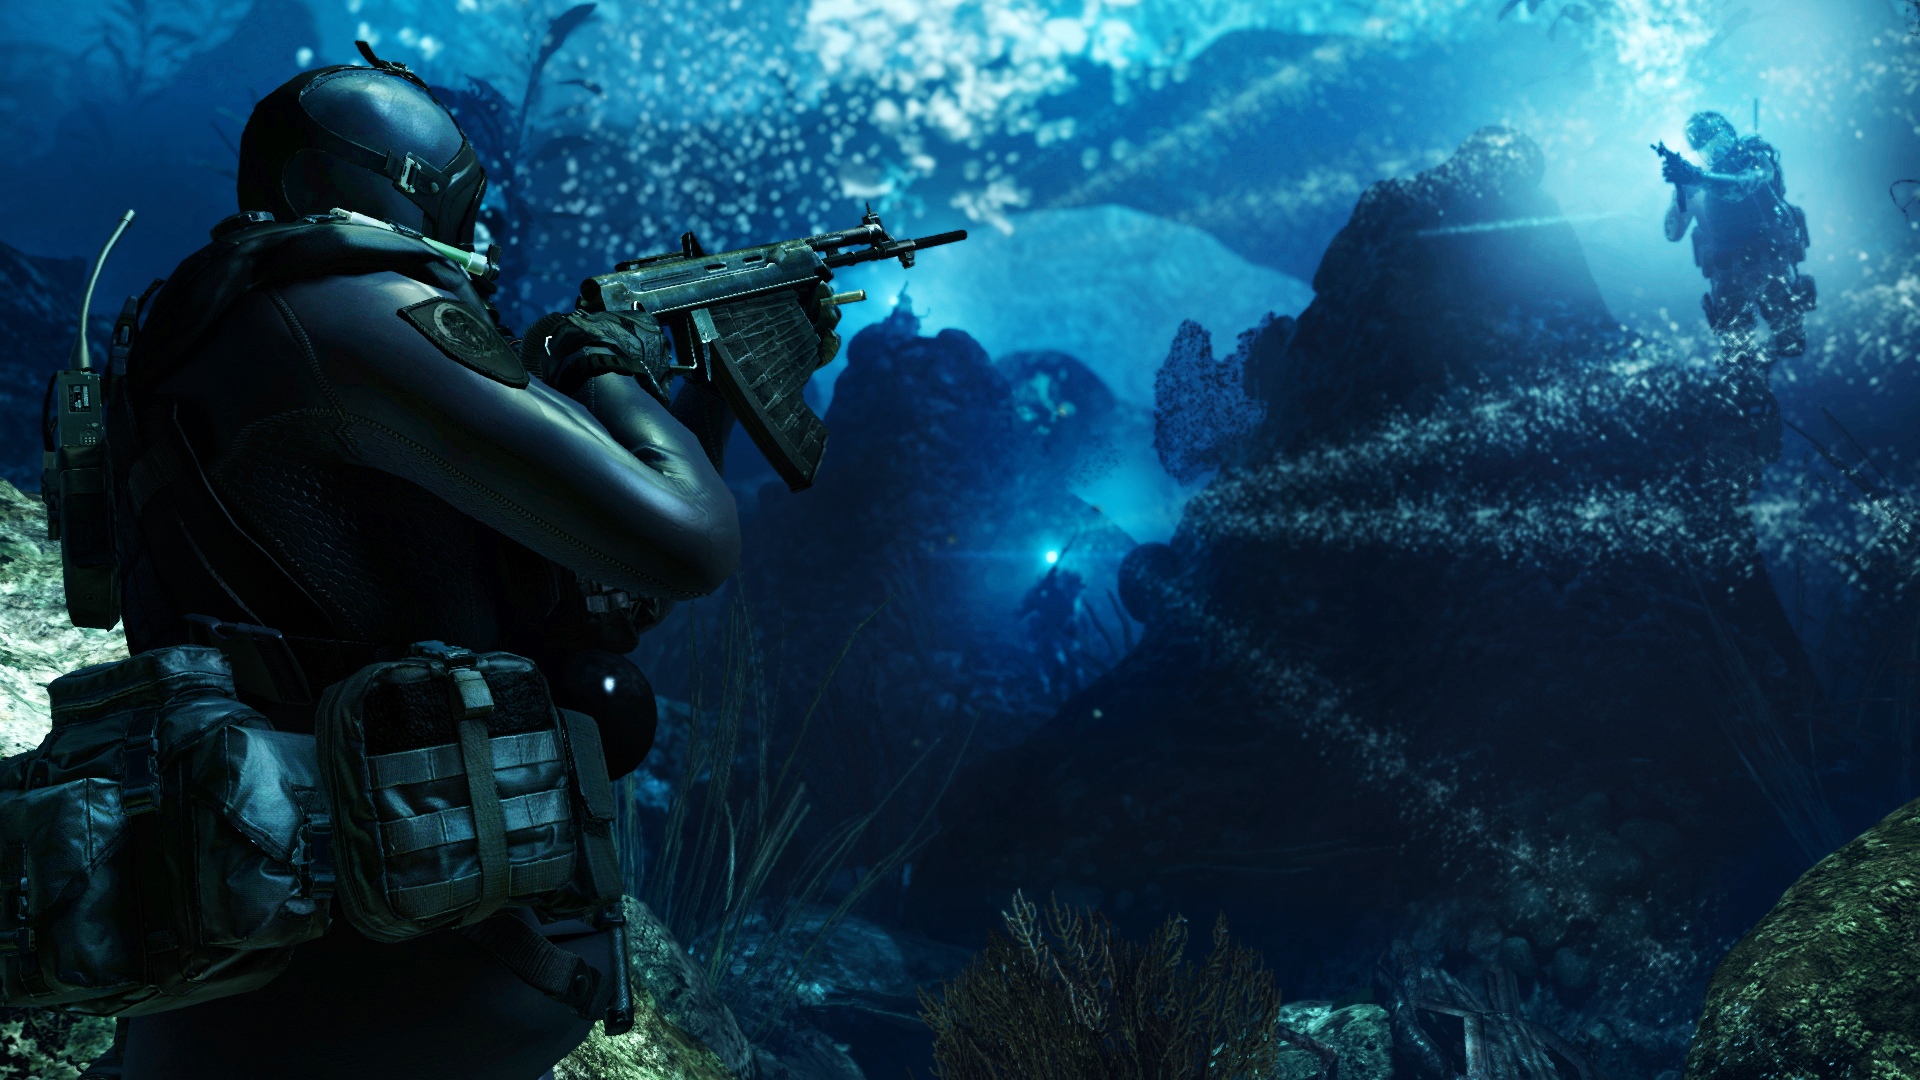 http://www.callofduty.com/content/dam/atvi/callofduty/ghosts/images/CODGhosts_UnderwaterAmbush.jpg